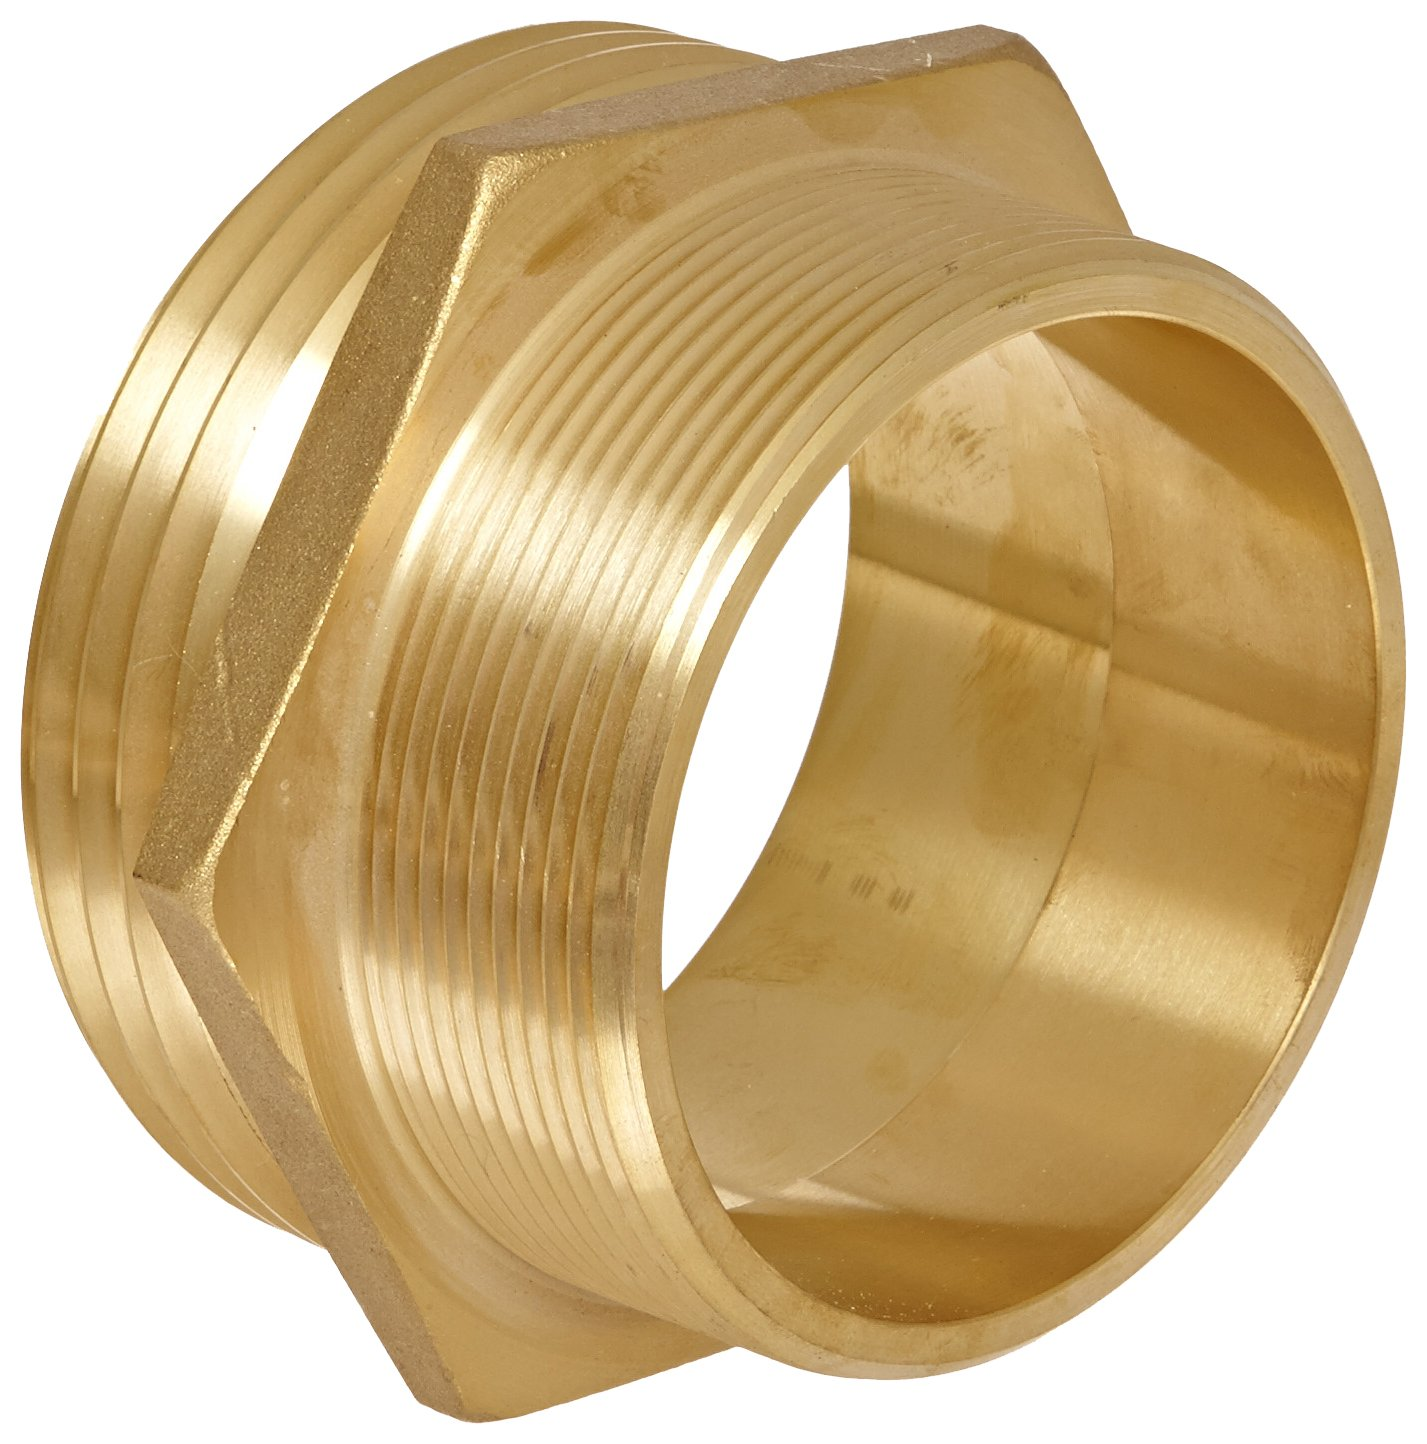 Moon 358-4064021 Brass Fire Hose Adapter, Nipple, 4